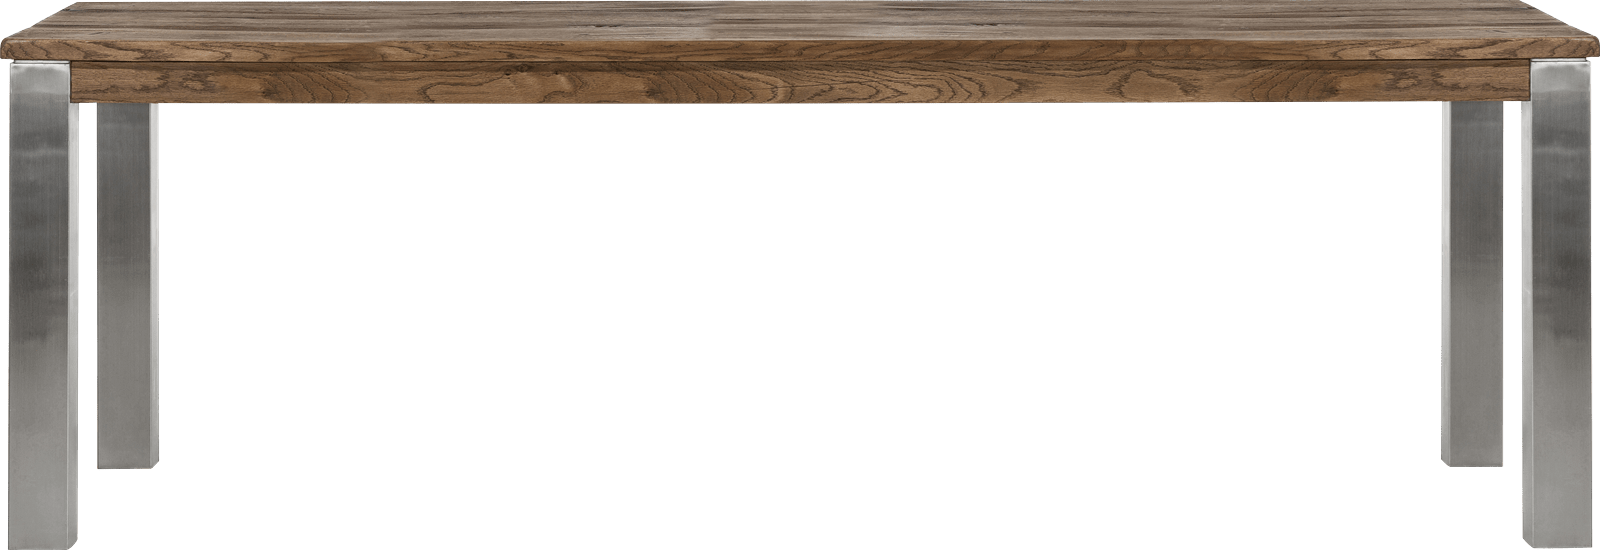 Masters - table 240 x 100 cm - inox 9x9